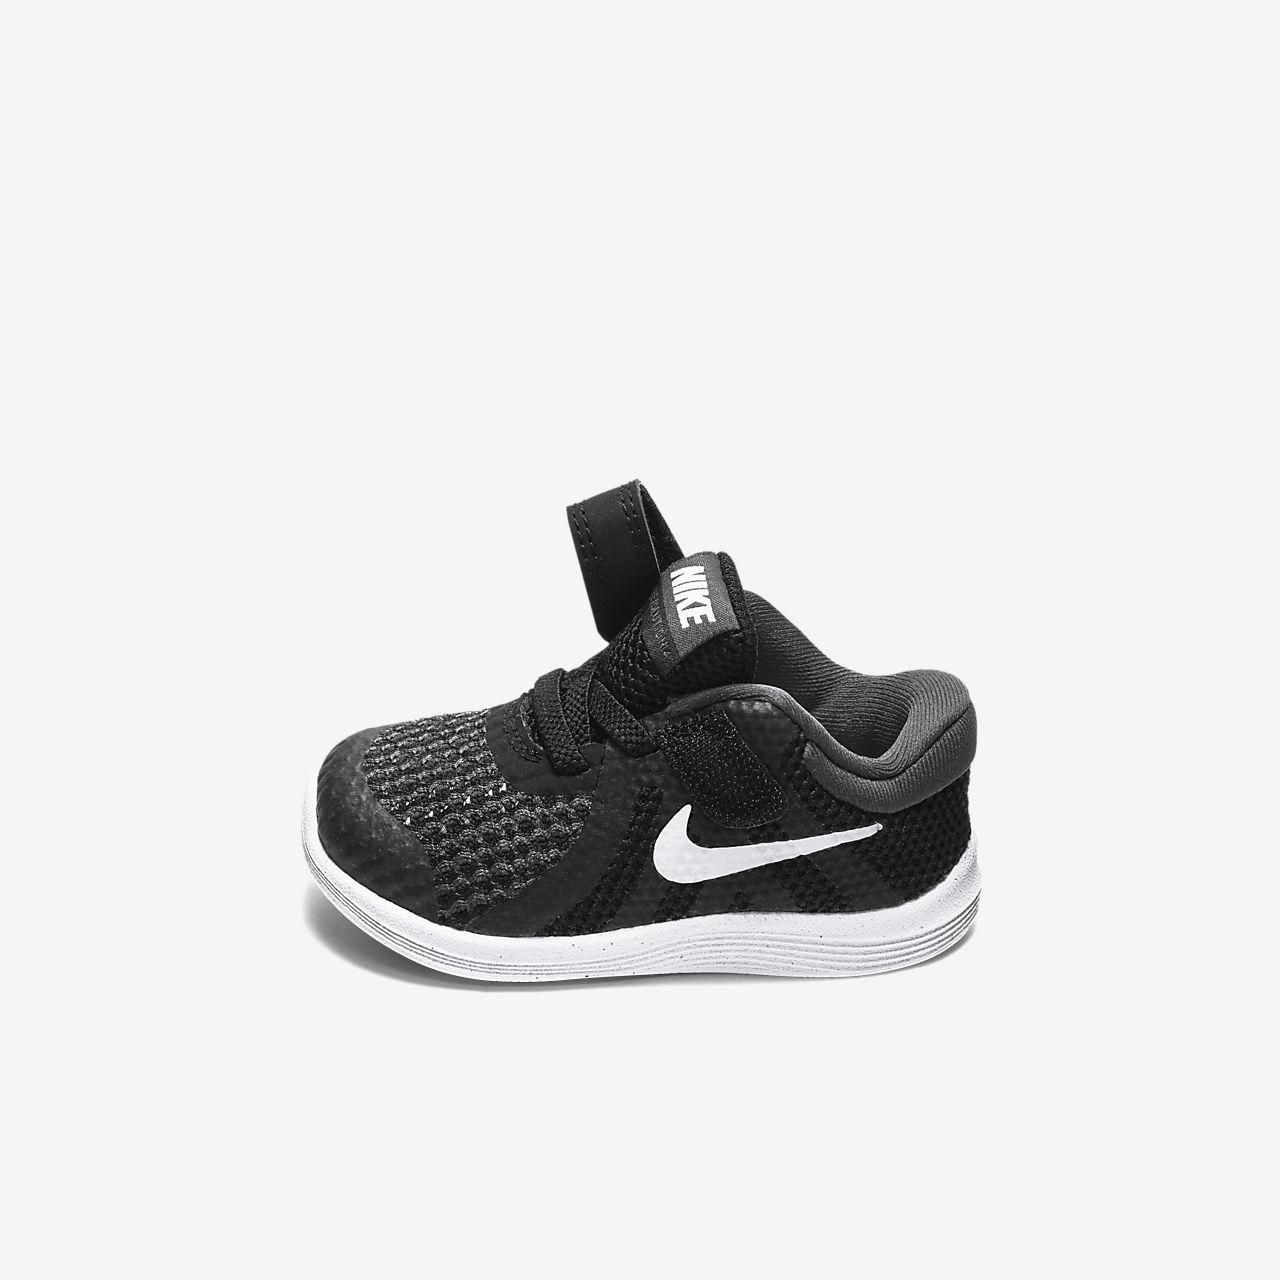 NIKE PERFORMANCE Nike Revolution 4 Barato Barato Venta Caliente De Descuento Eastbay Salida a8gGjD